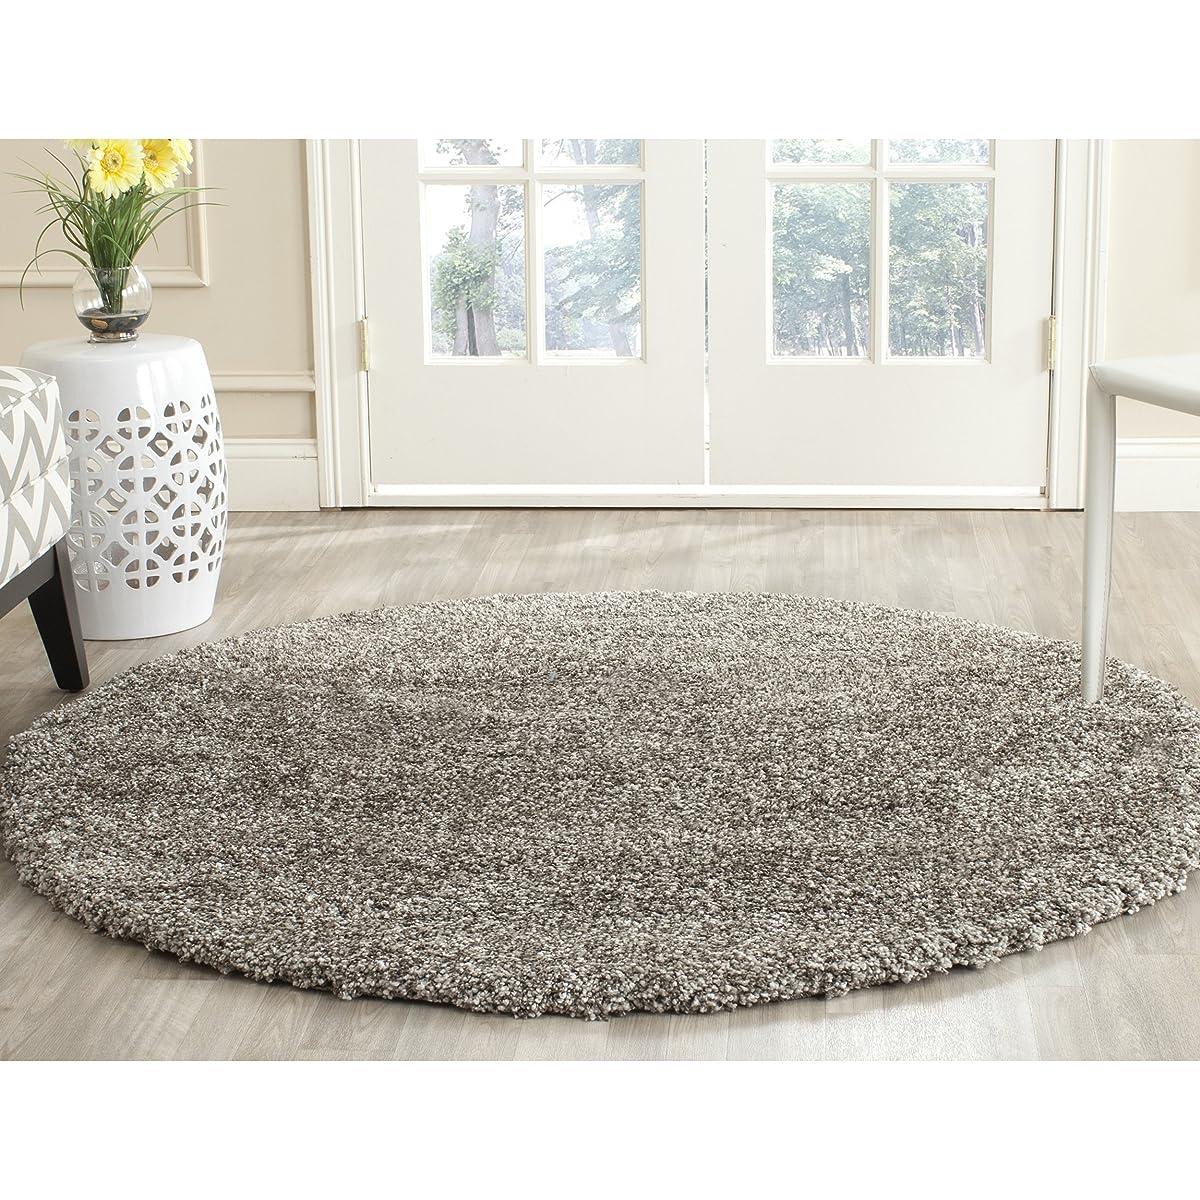 Safavieh Milan Shag Collection SG180-8080 Grey Round Area Rug (3 Diameter)